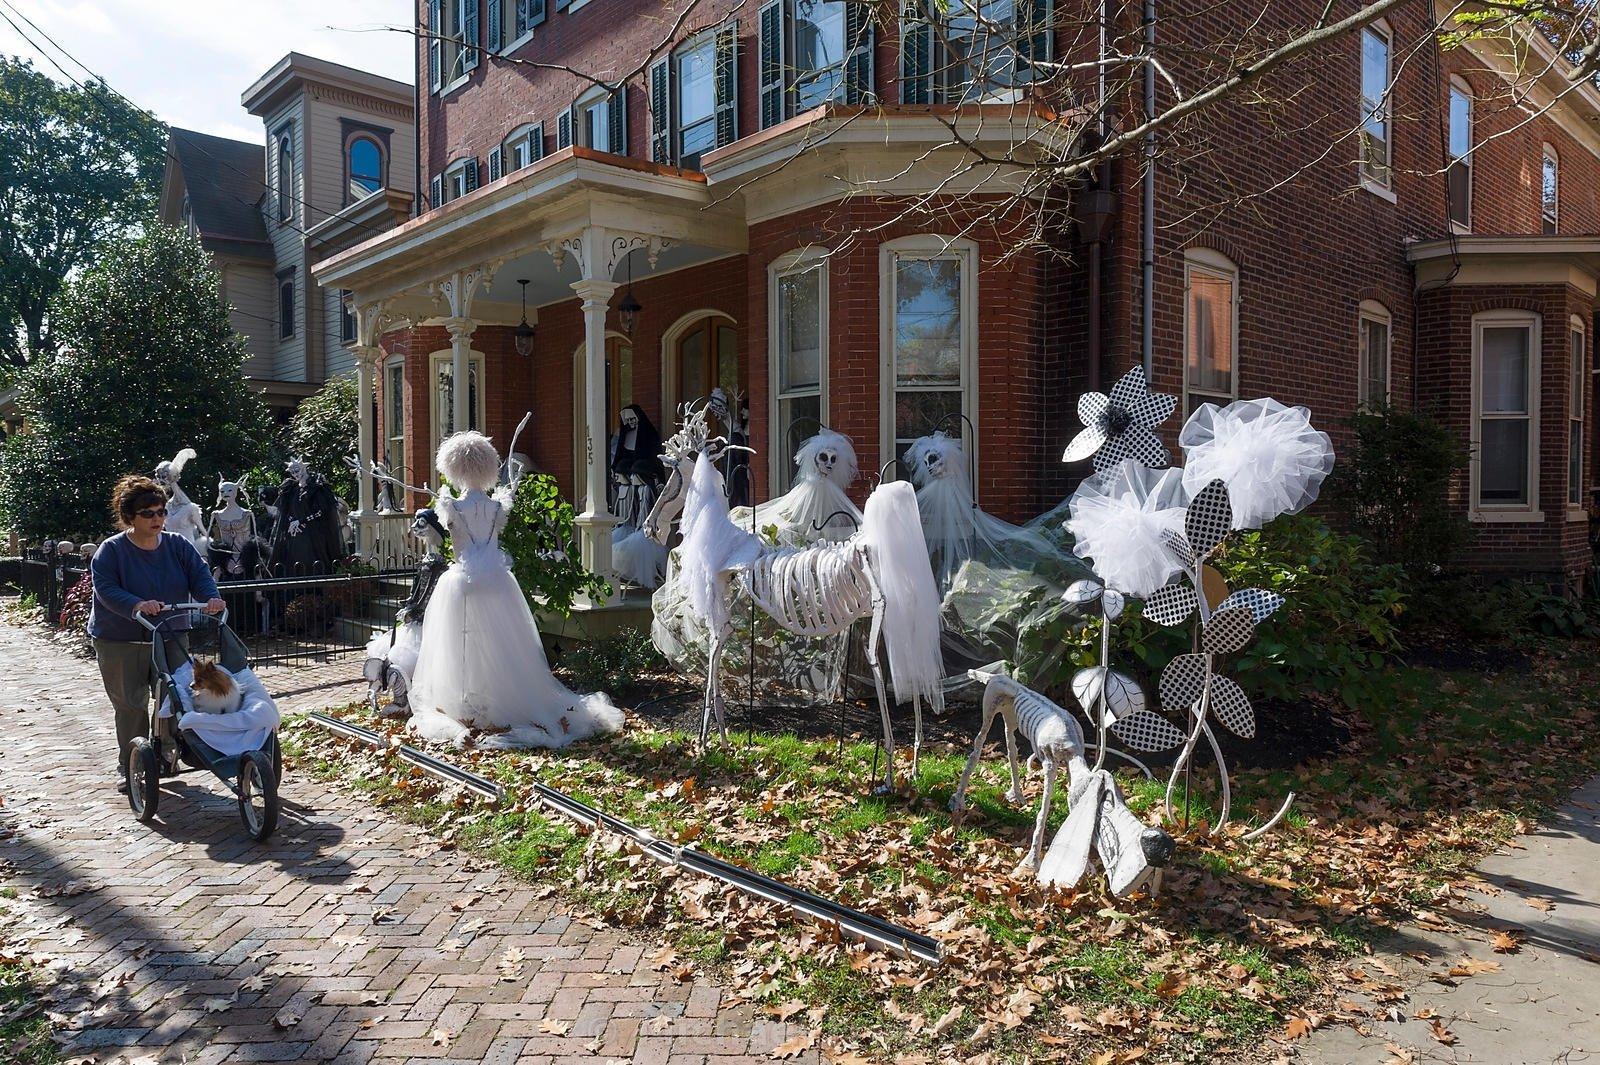 10 Nice Halloween Decoration Ideas For Yard easy halloween decoration ideas halloween lawn decorations 2020